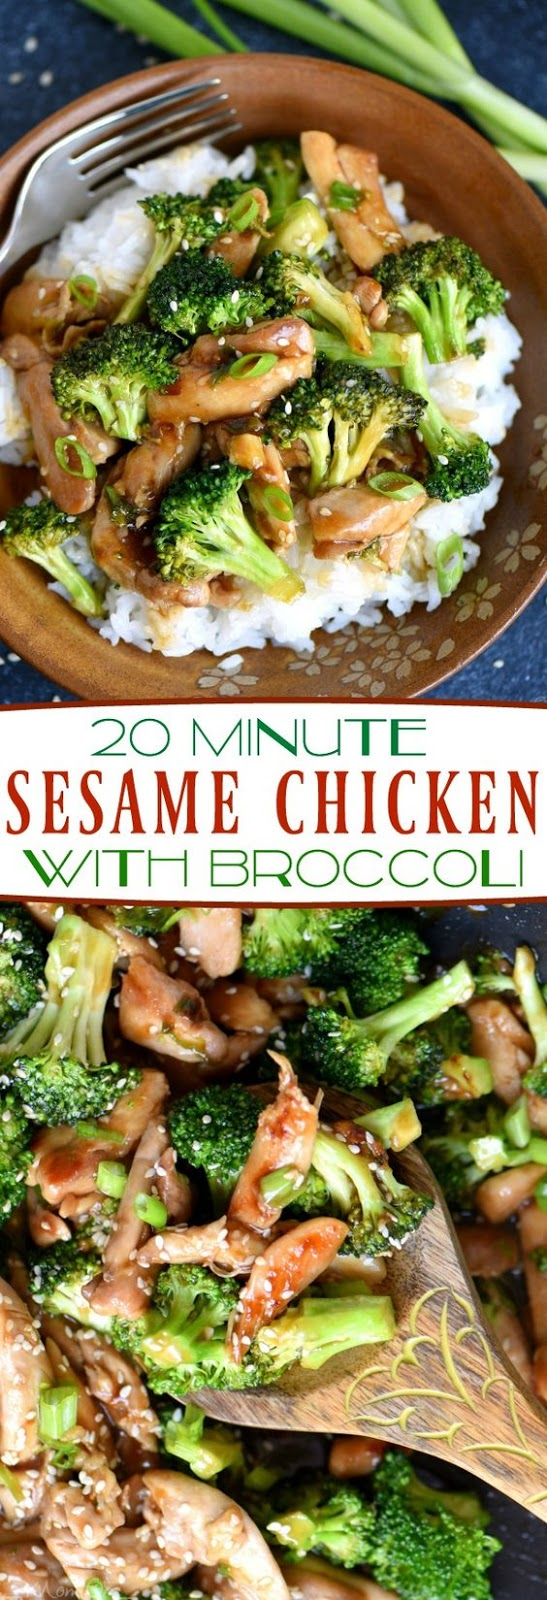 20 Minute Sesame Chicken and Broccoli